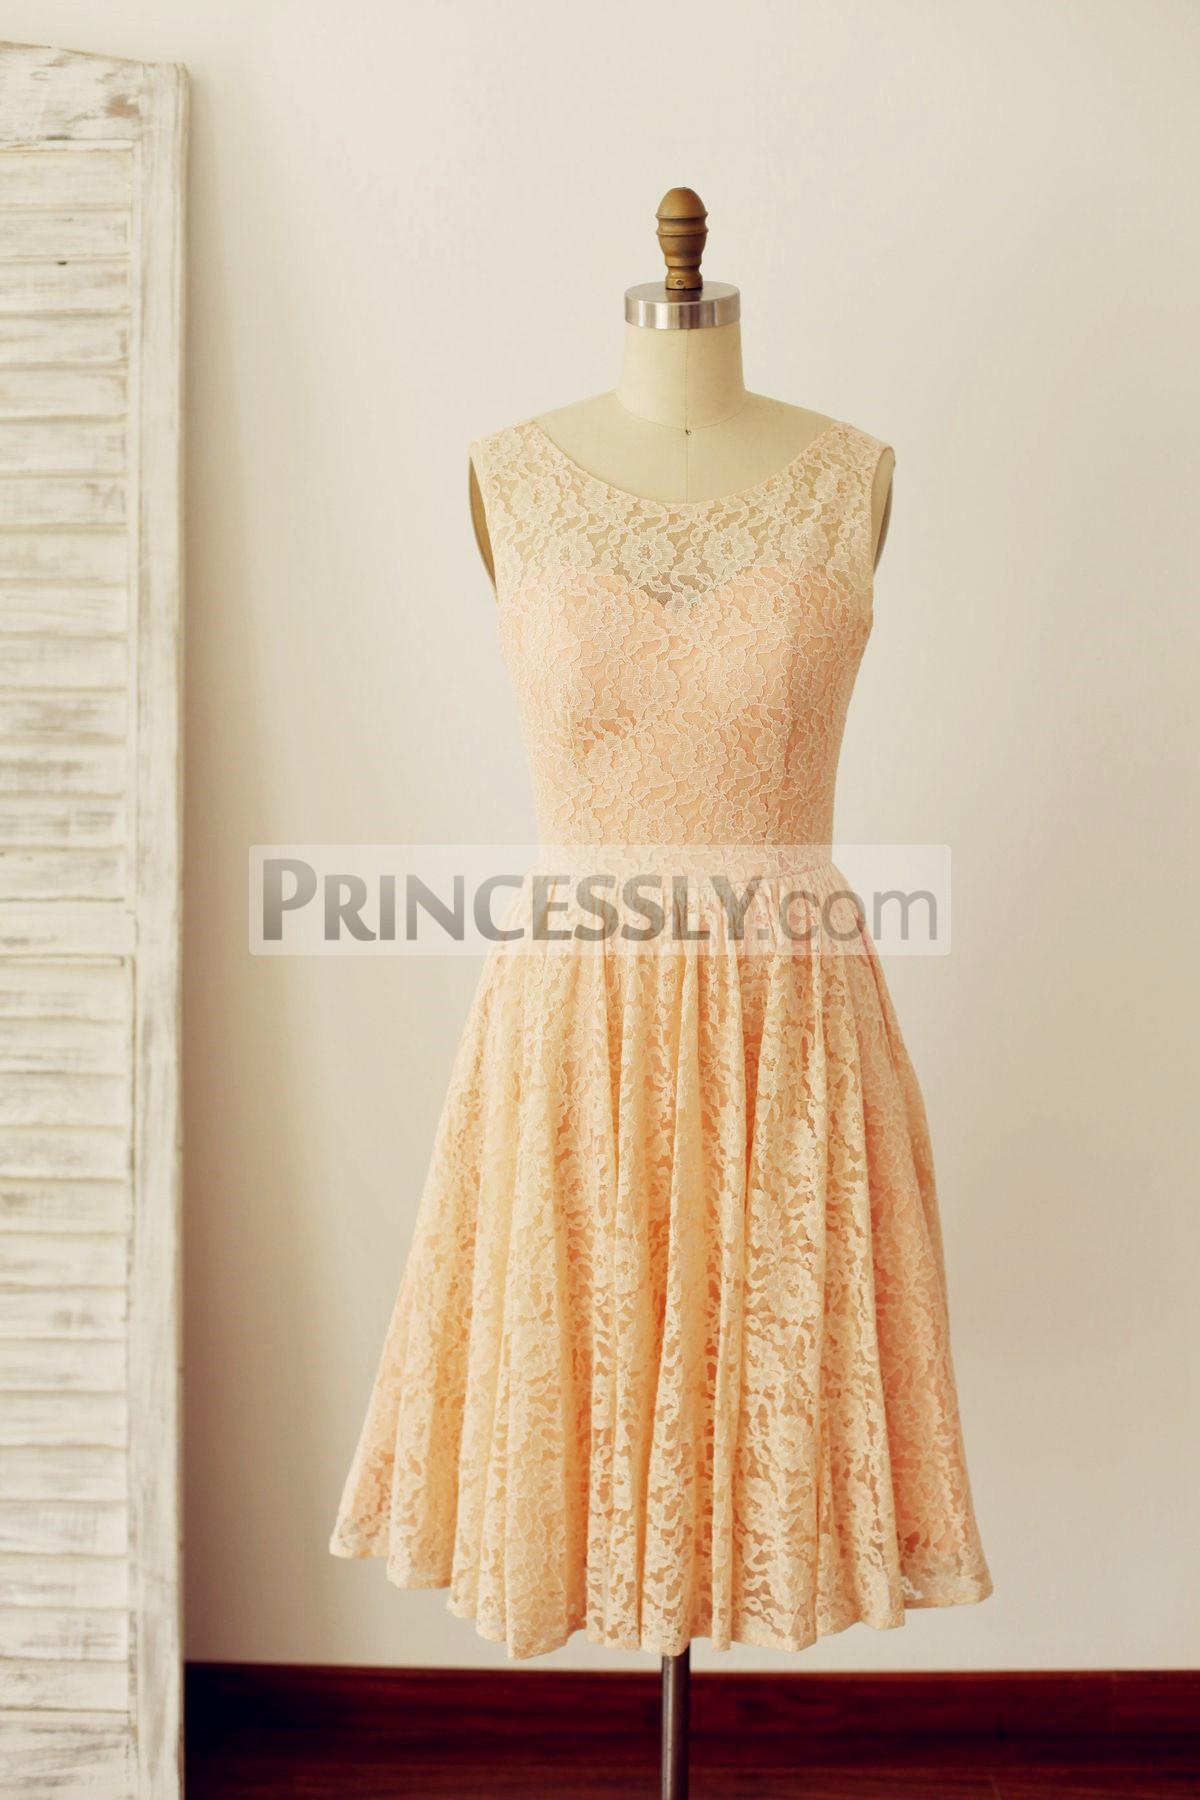 Princessly.com-K1000216-Peach Pink Lace Deep V Back Short Bridesmaid Dress with bow-31